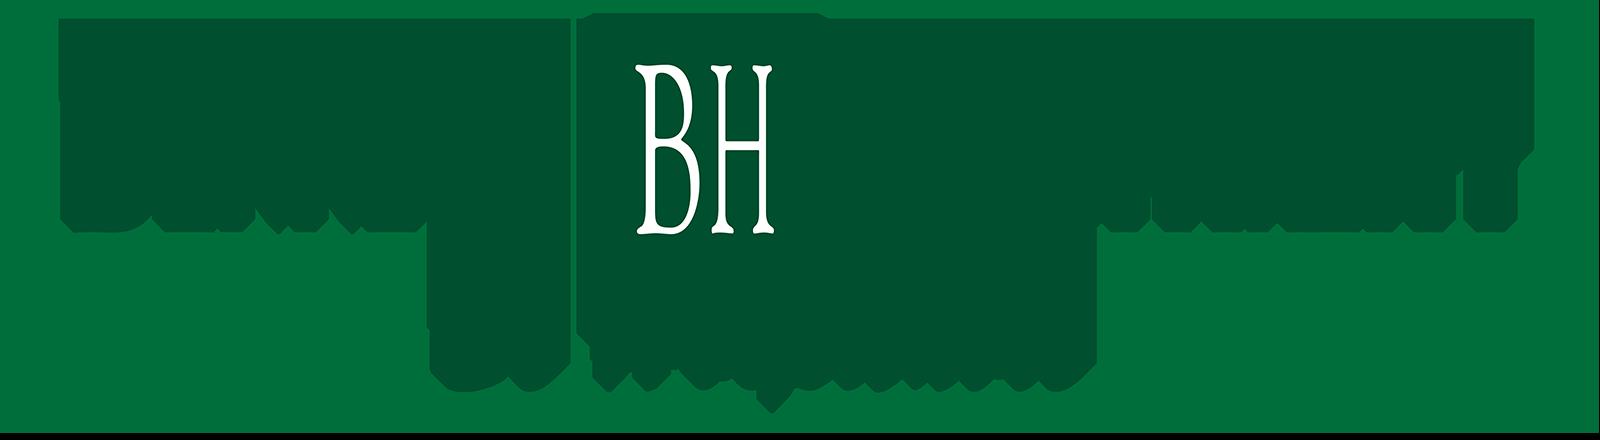 bennet-hospitality